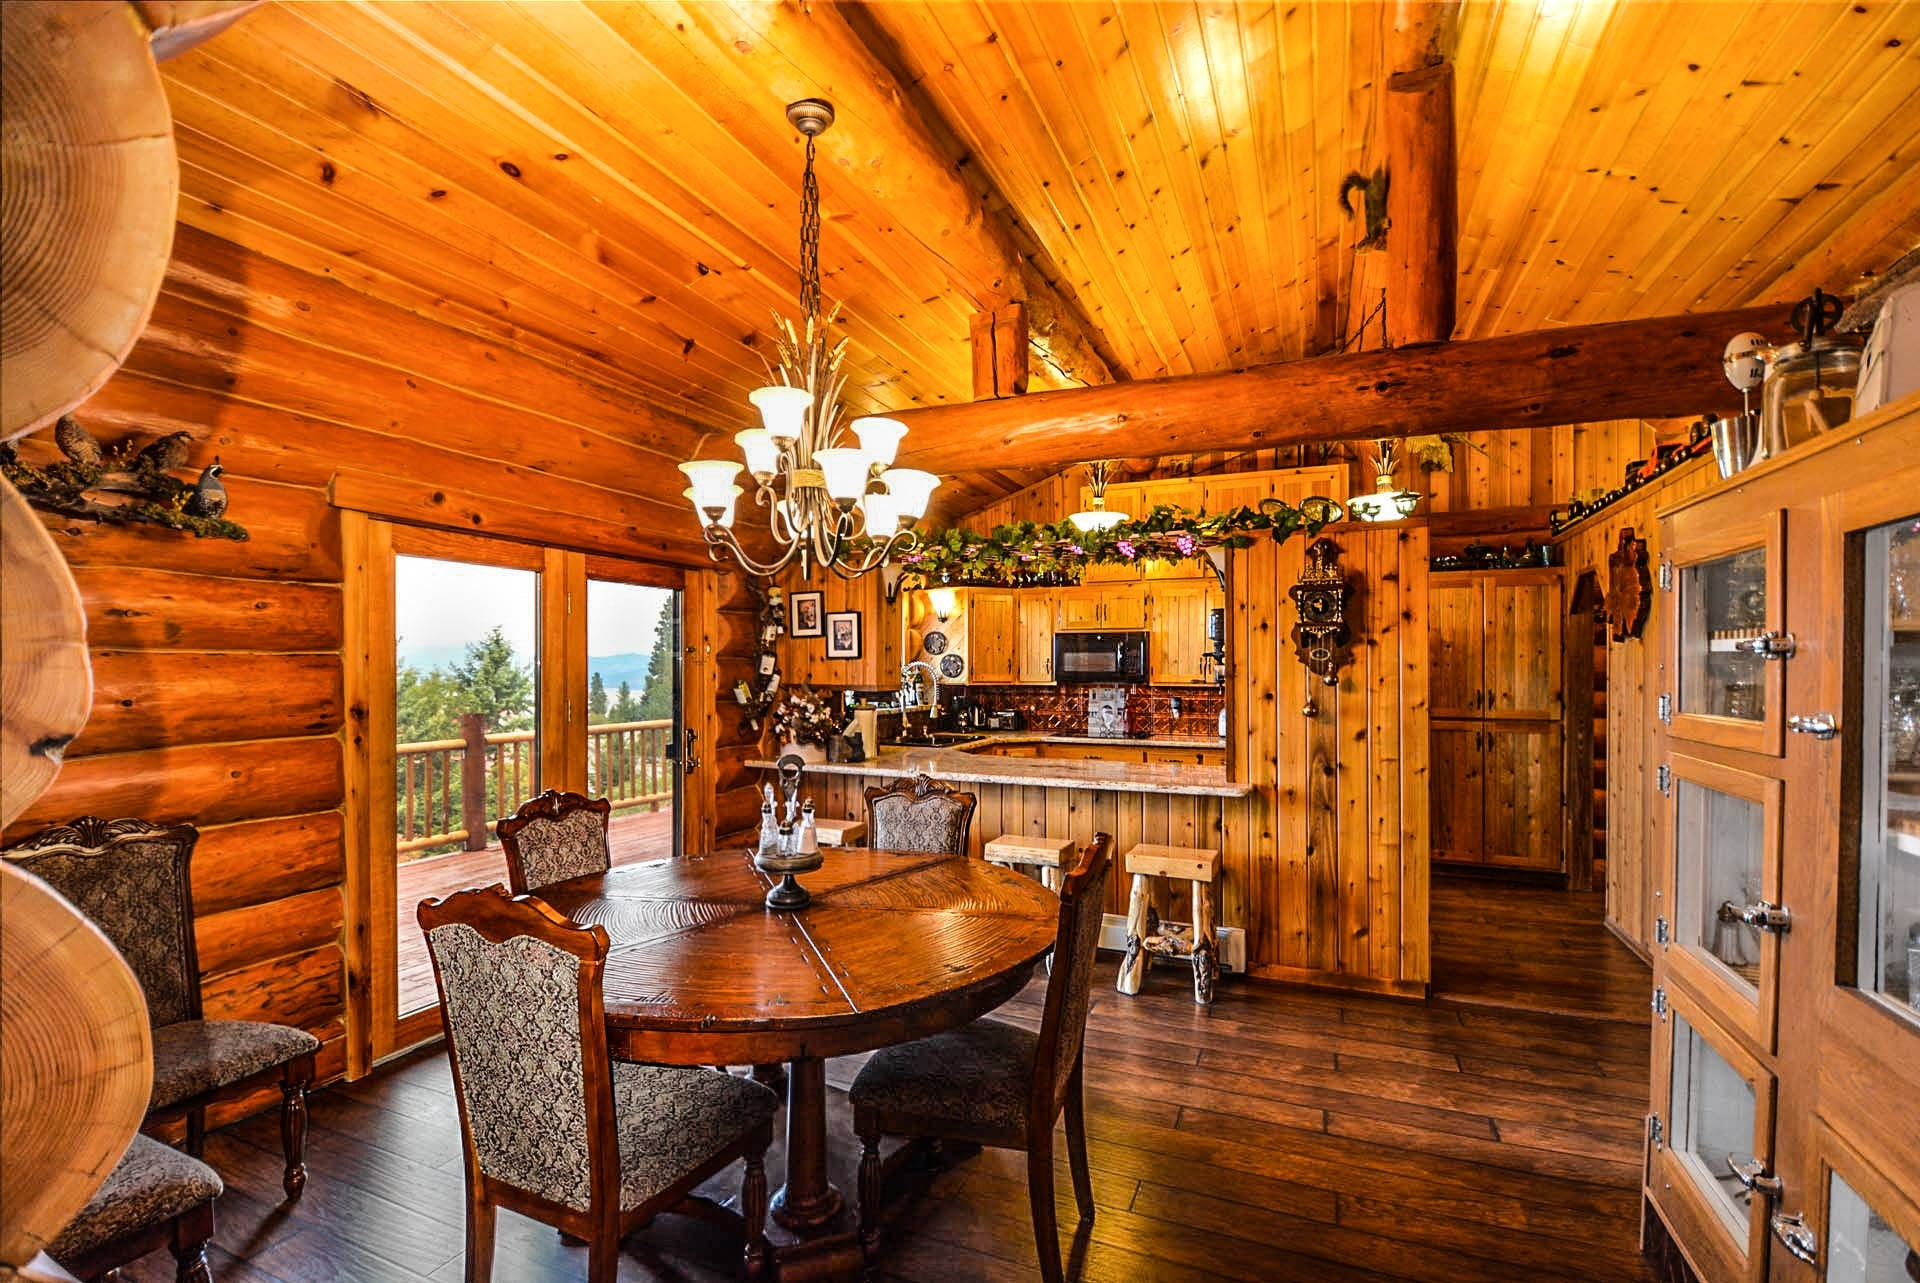 Free stock photo of wood, house, architecture, kitchen